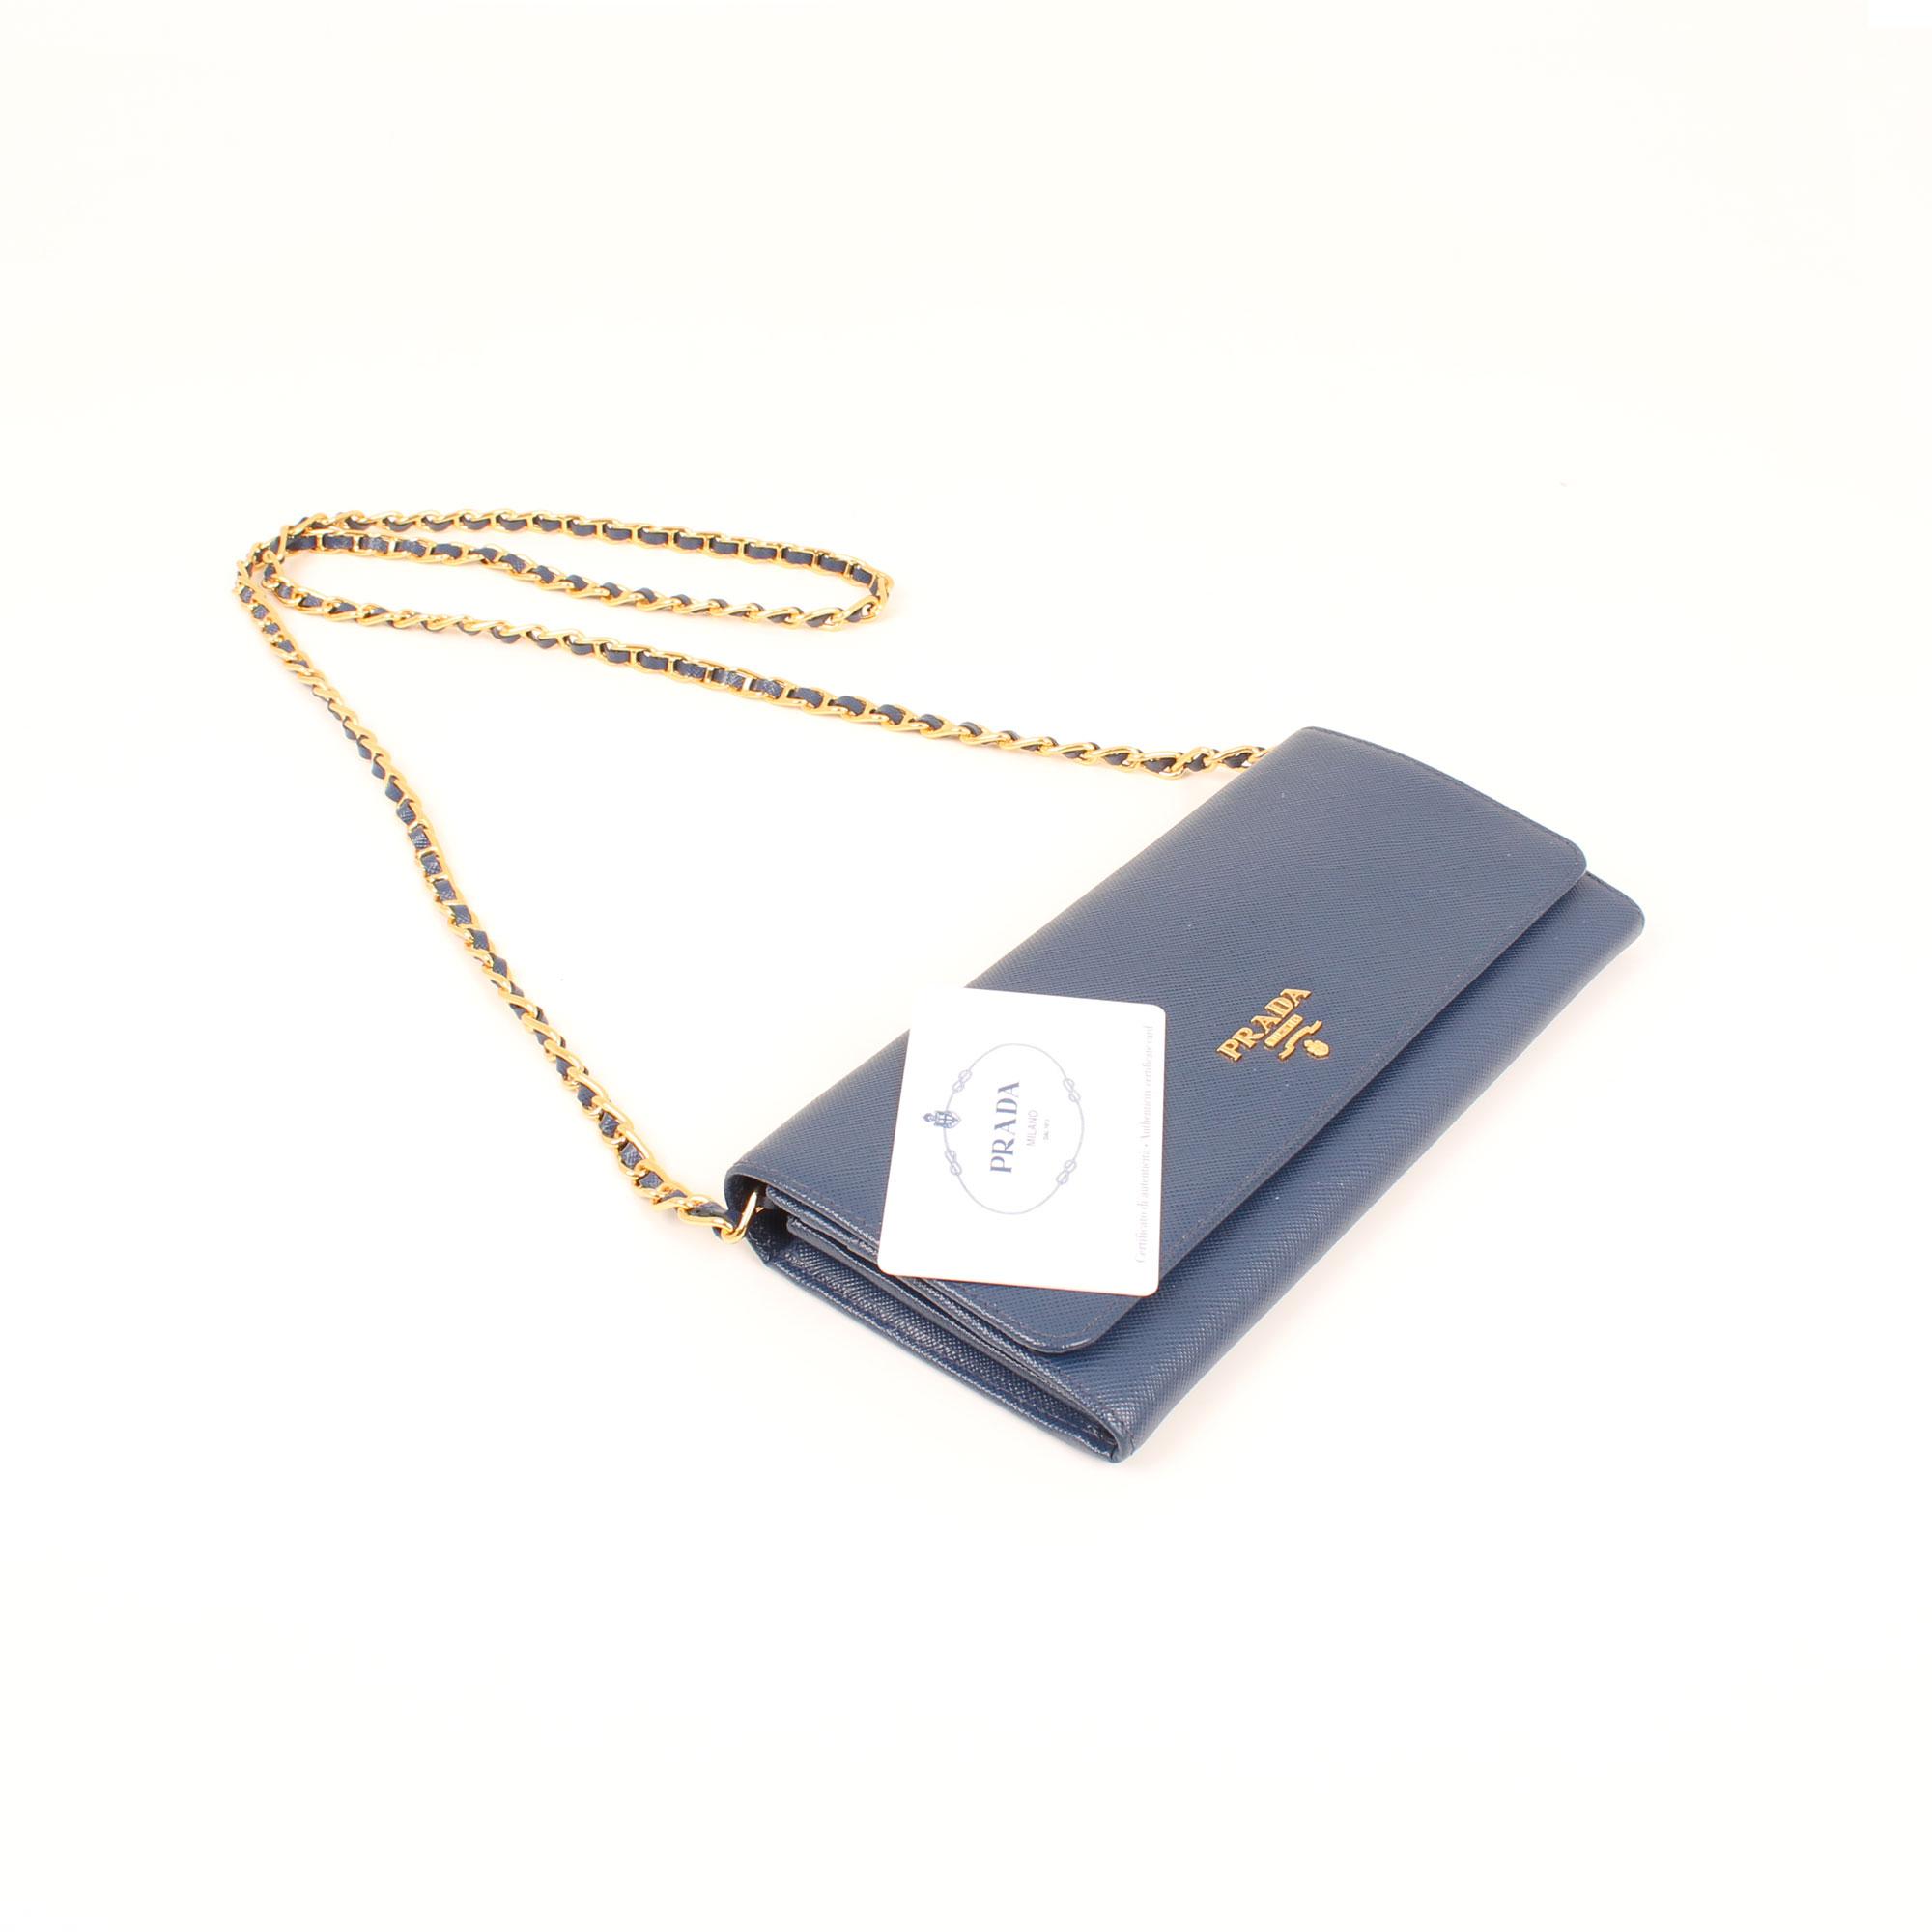 bag-prada-wallet-on-chain-saffiano-metal-bluette-blue-card